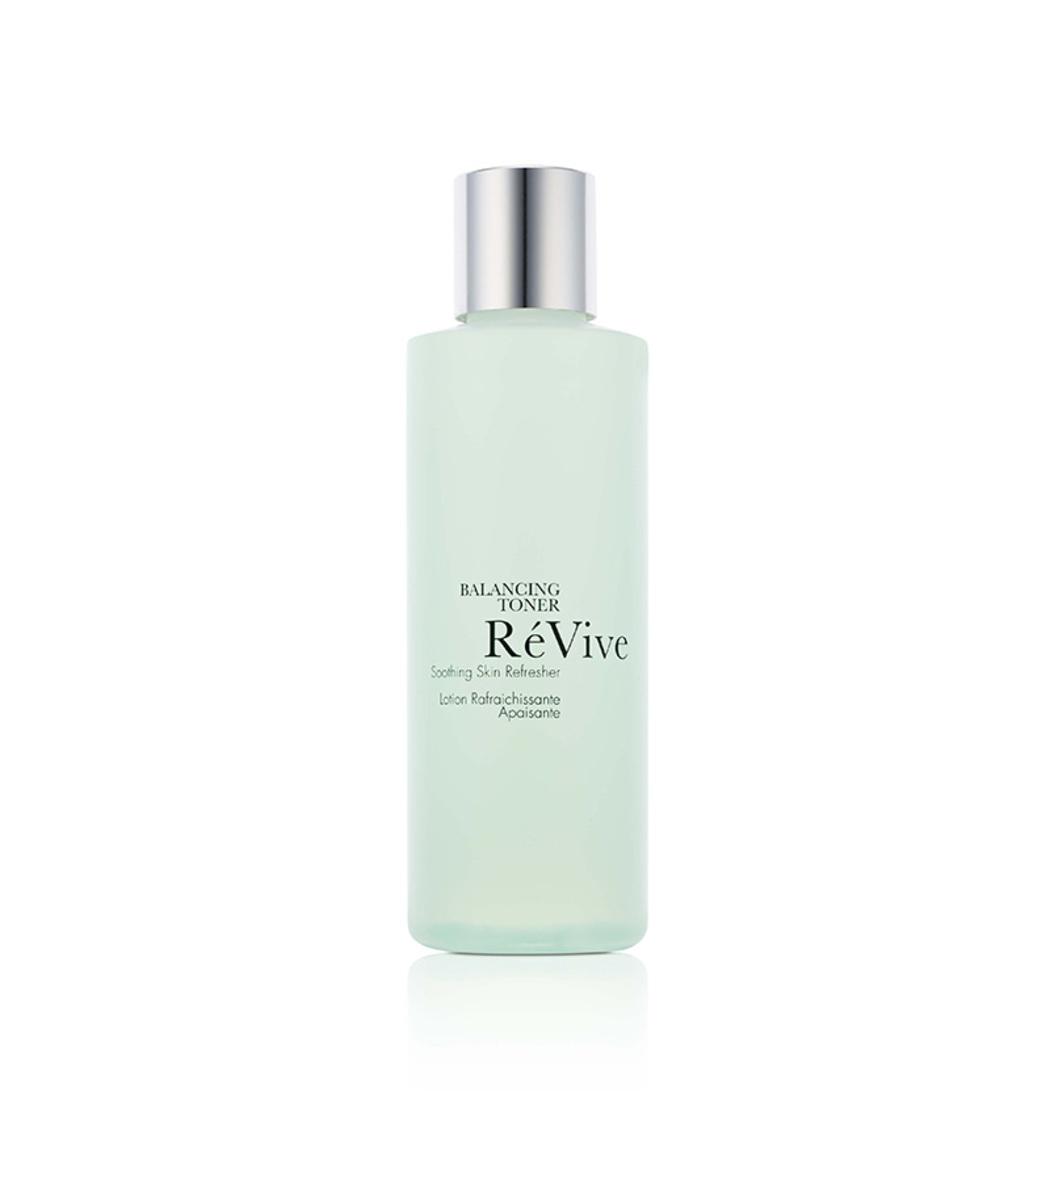 REVIVE Balancing Toner Soothing Skin Refresher